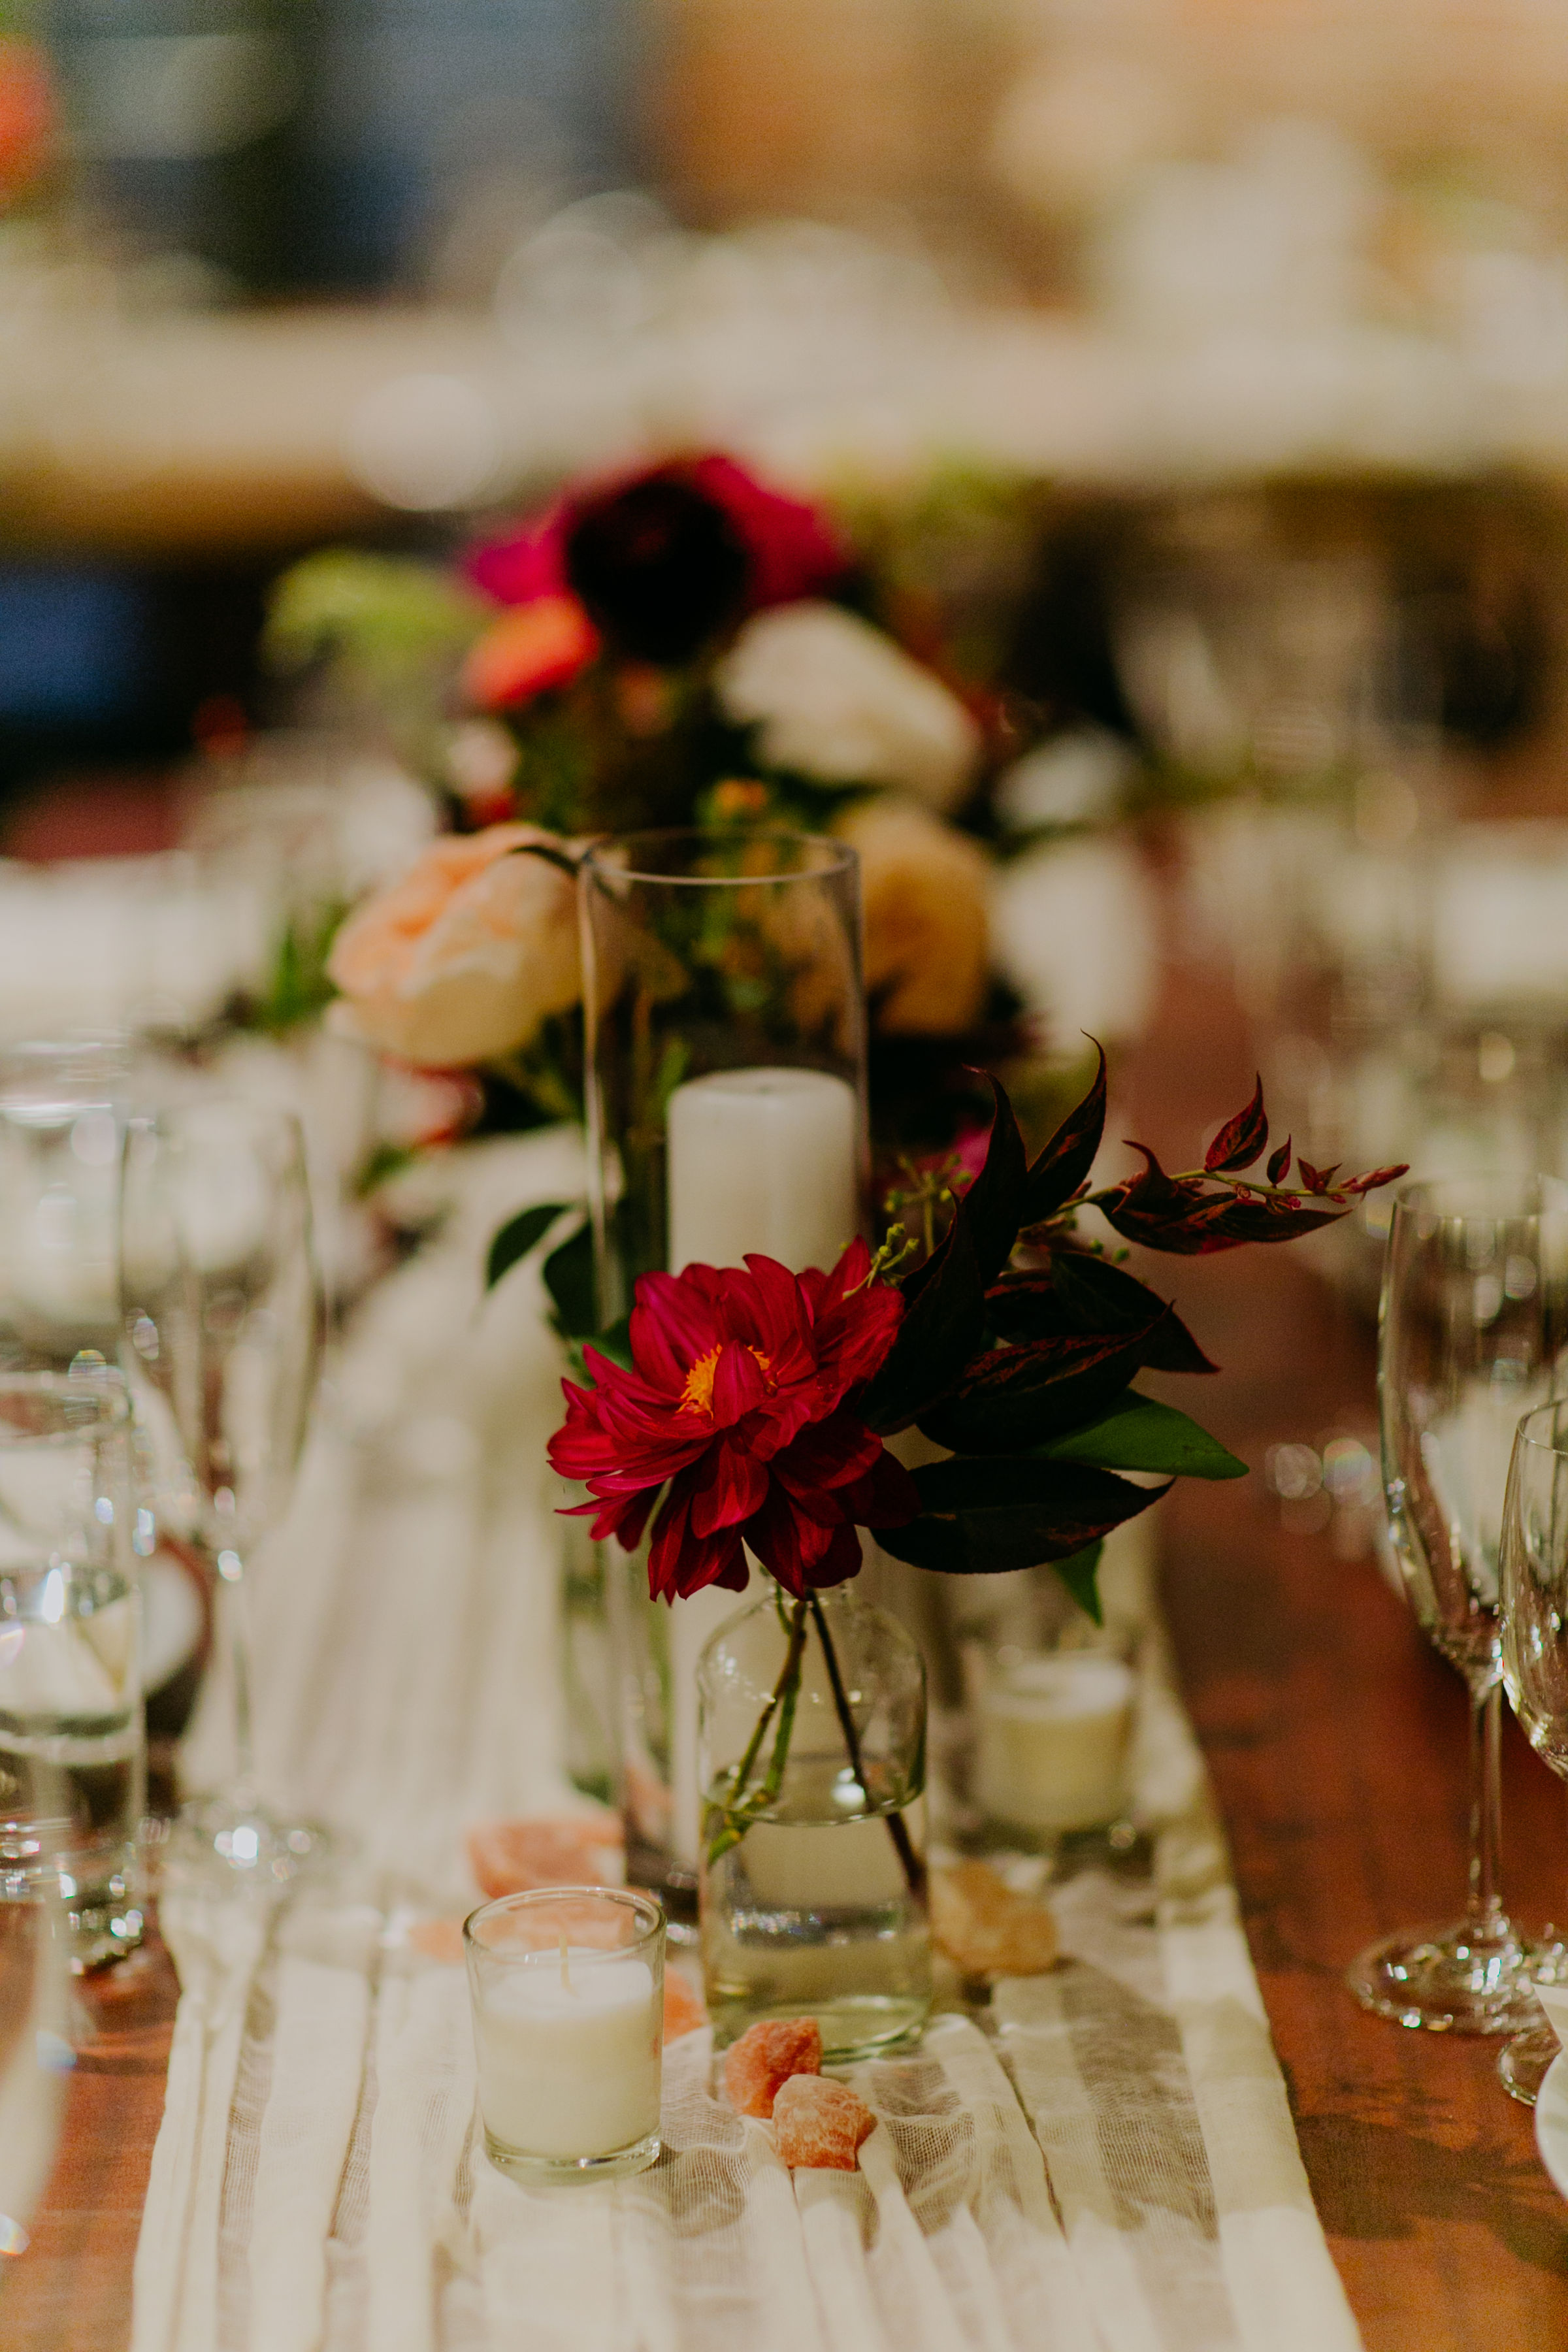 wythe-hotel-wedding-photographer-amber-gress-0438.jpg